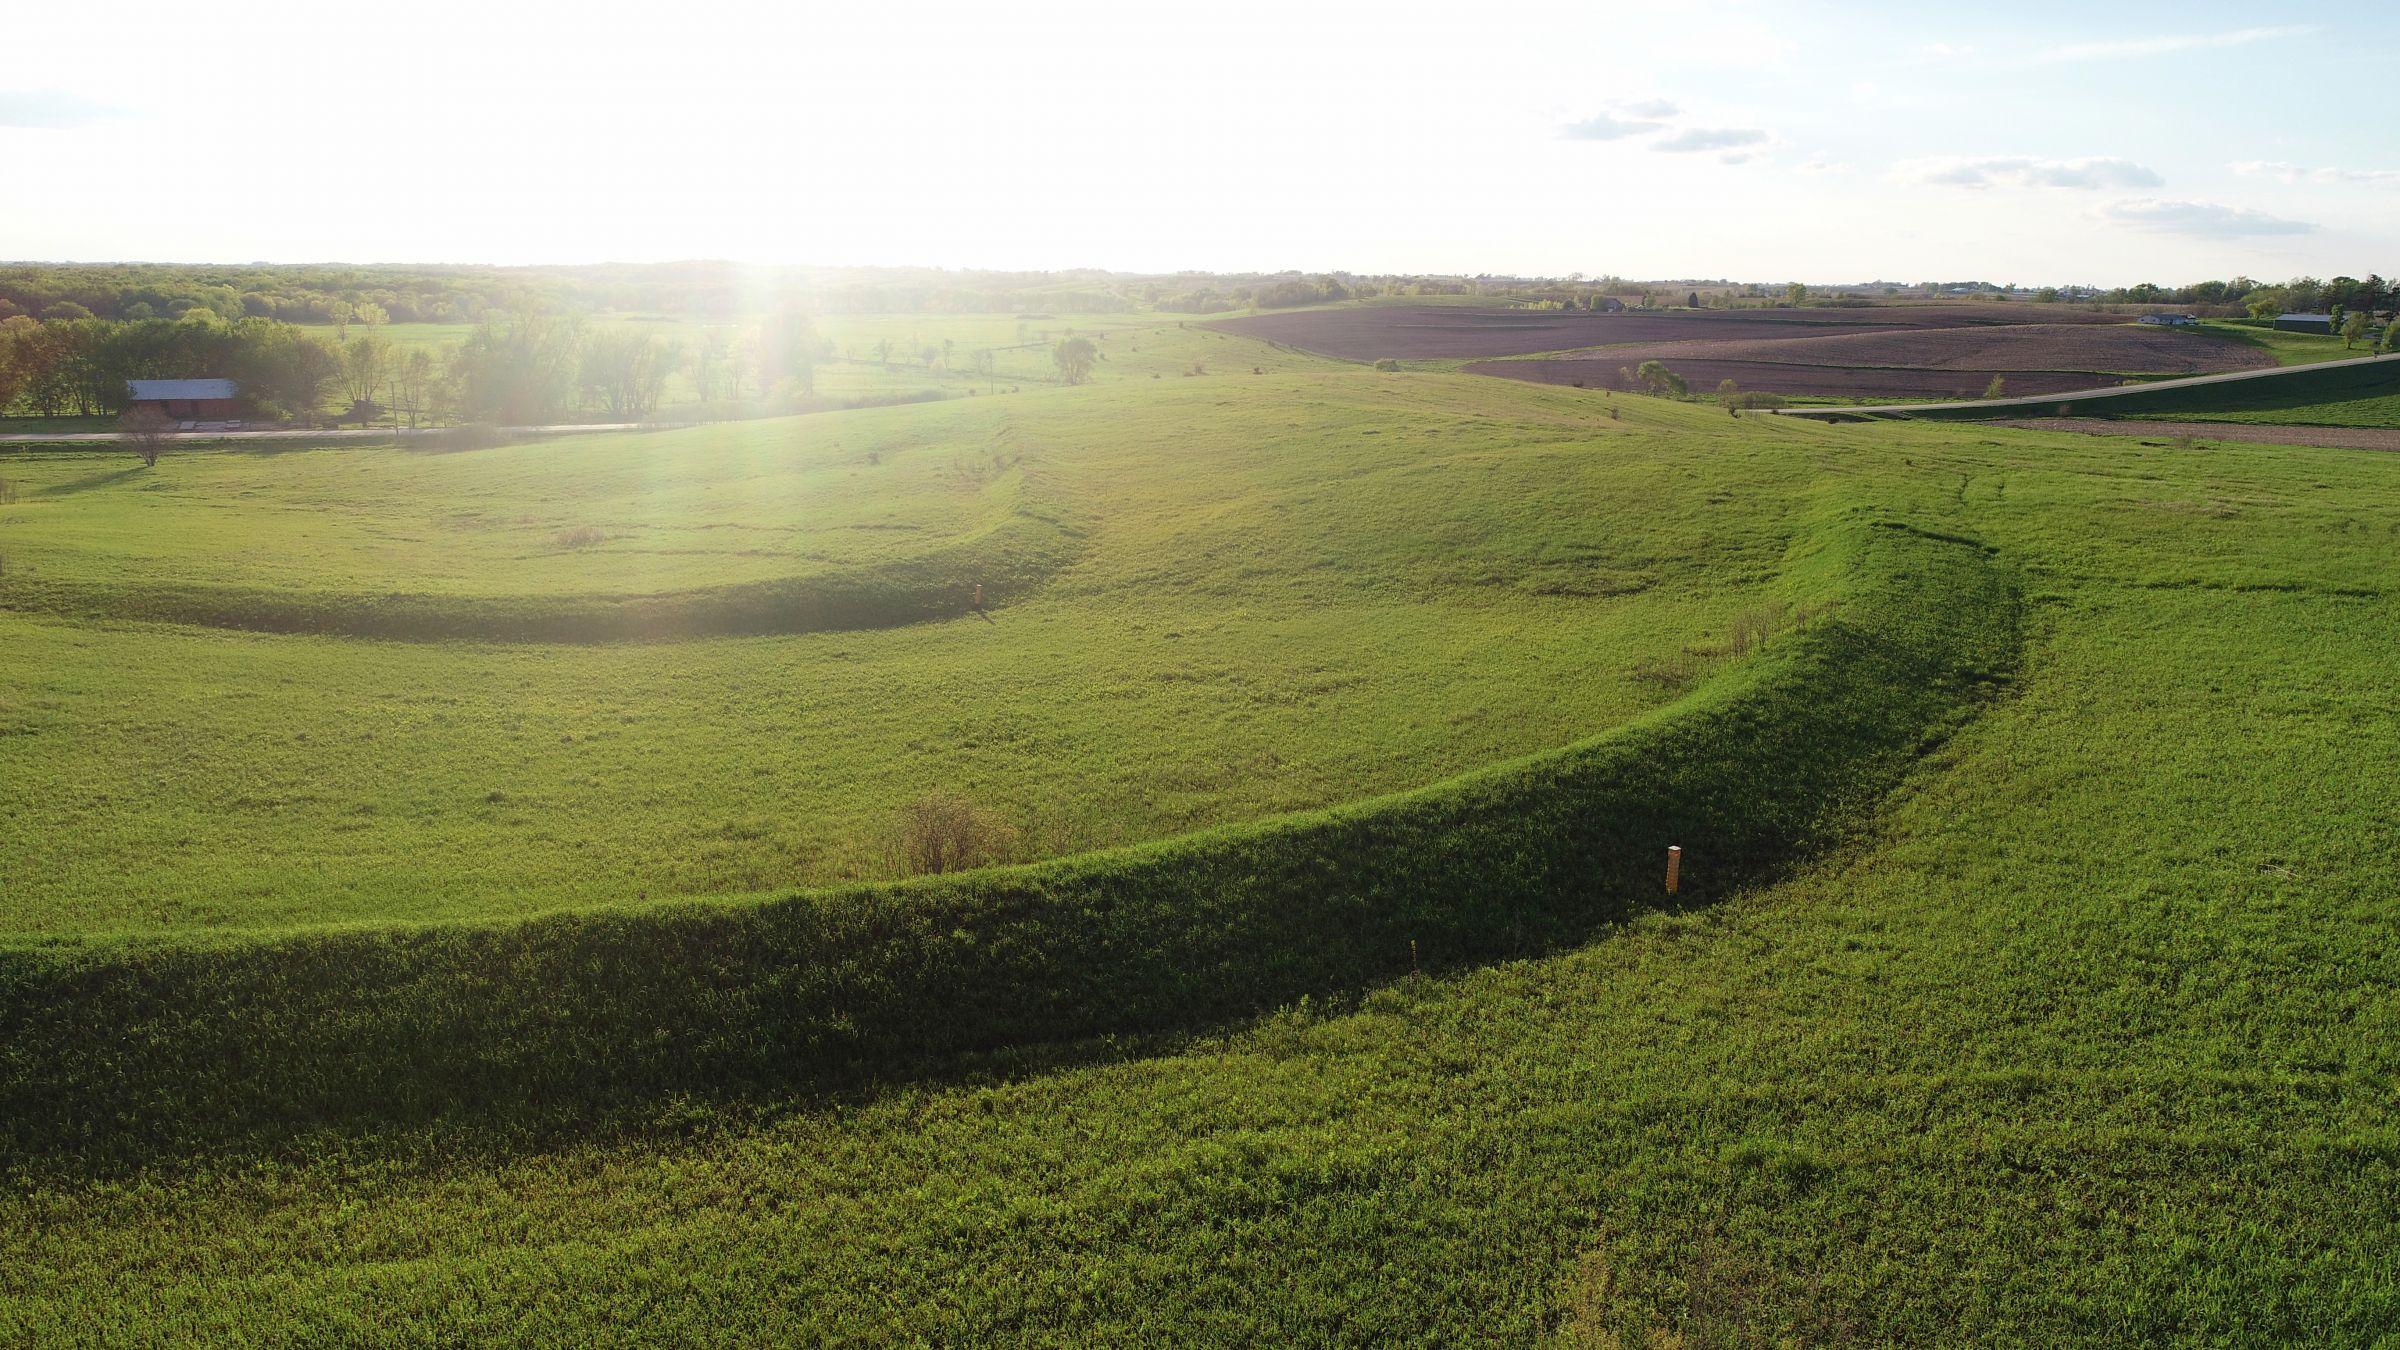 Washington County Iowa Land For Sale 13.jpg